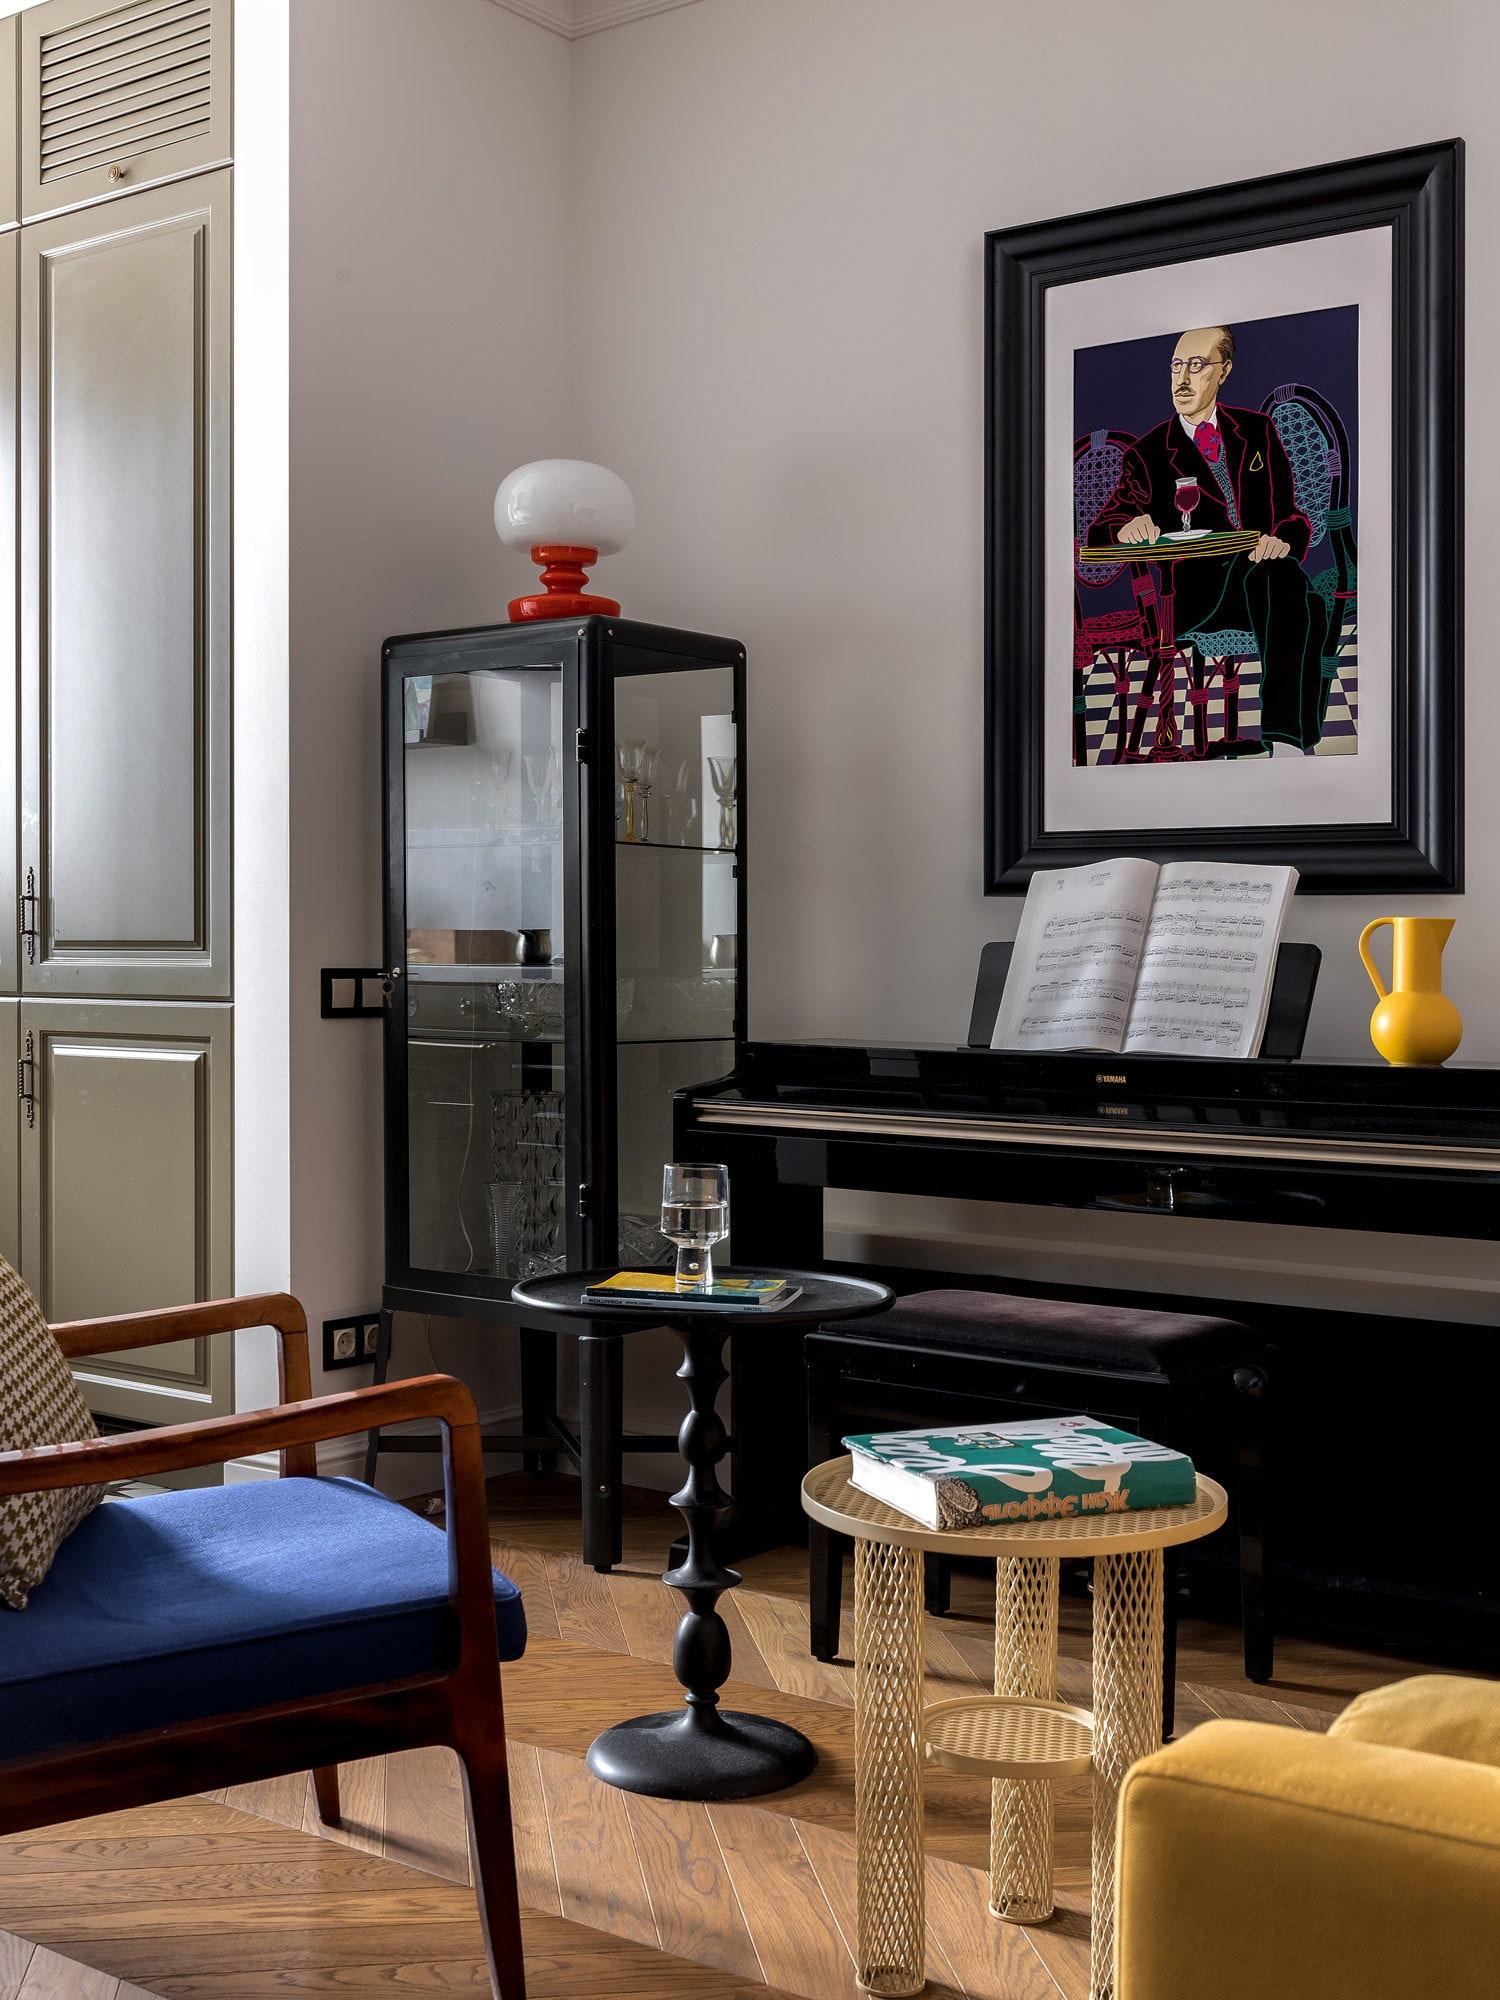 .     Fusion Decor   Pols Potten    Moroso   Raawii        IKEA       .   .   .